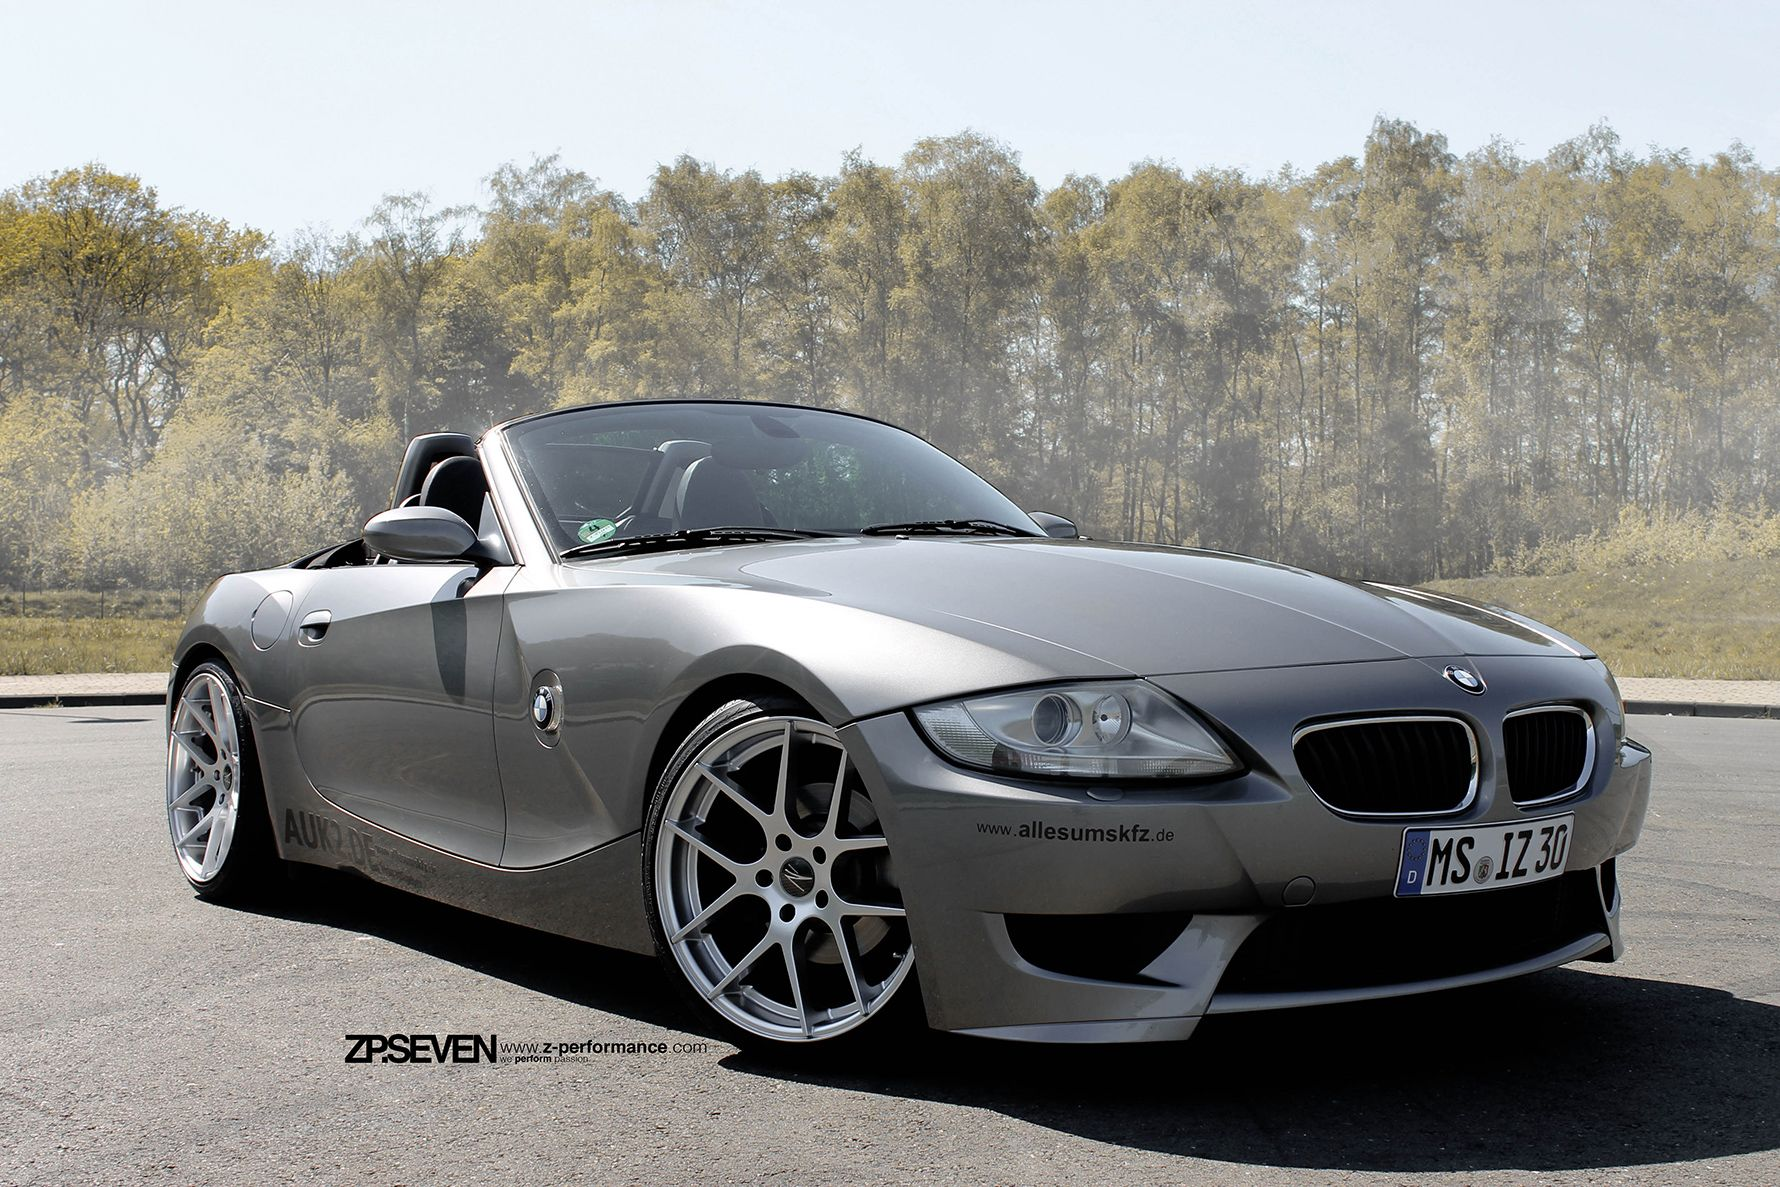 medium resolution of z performance zroadster com bmw z1 z2 z3 z4 z8 m mini roadster coupe